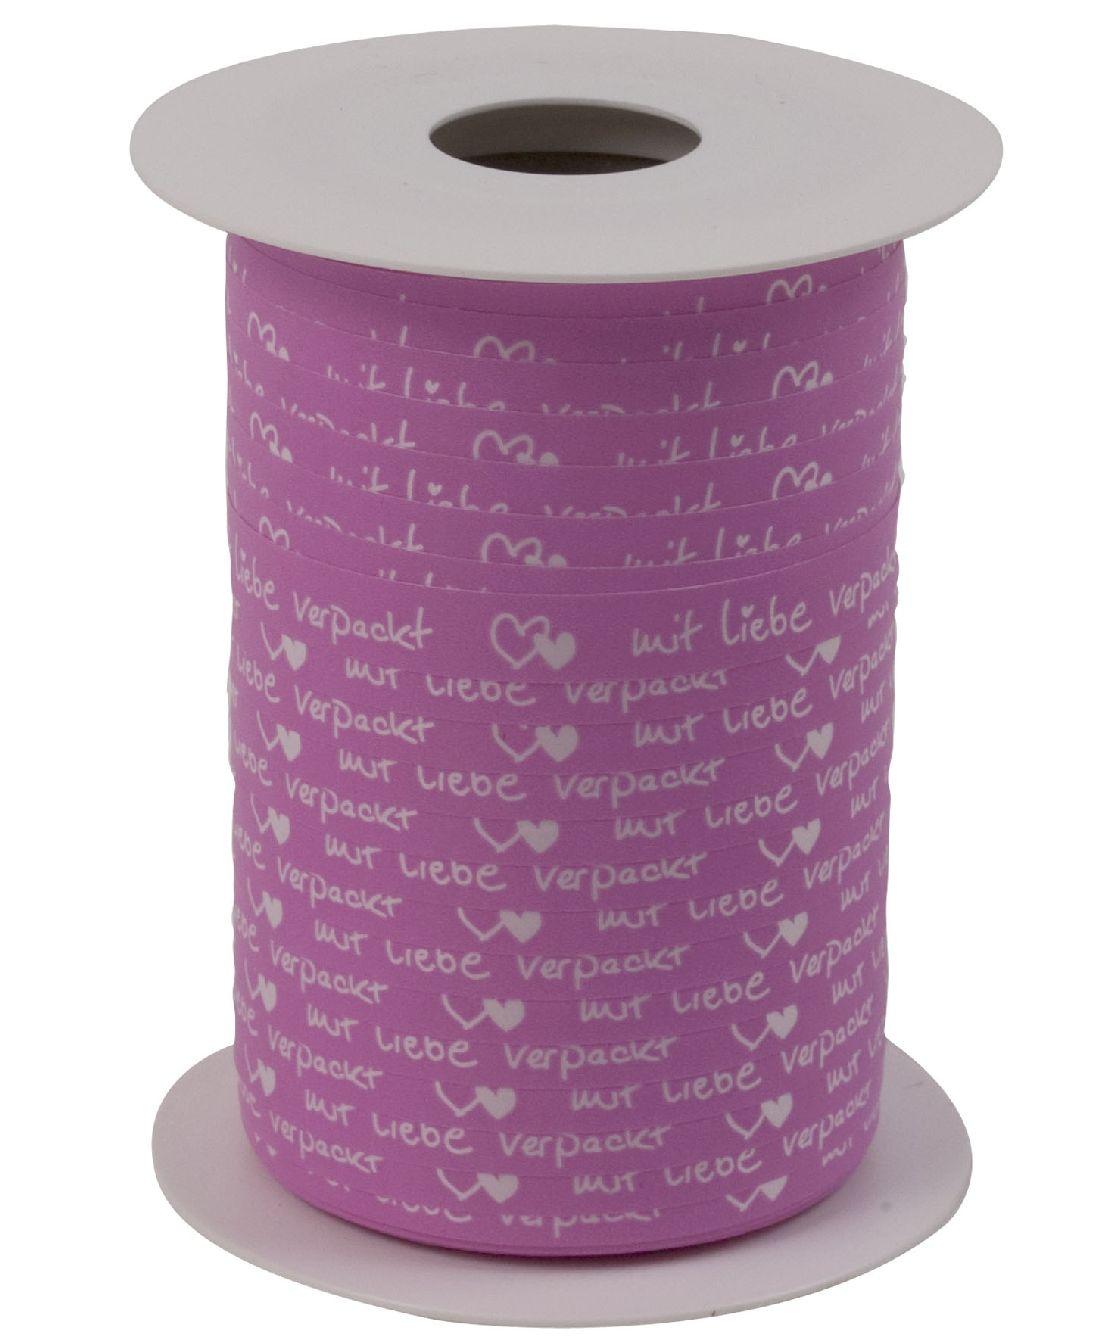 Polyband Mit Liebe verpackt PINK 8169 Ringelband 10mm  150Meter Ziehband